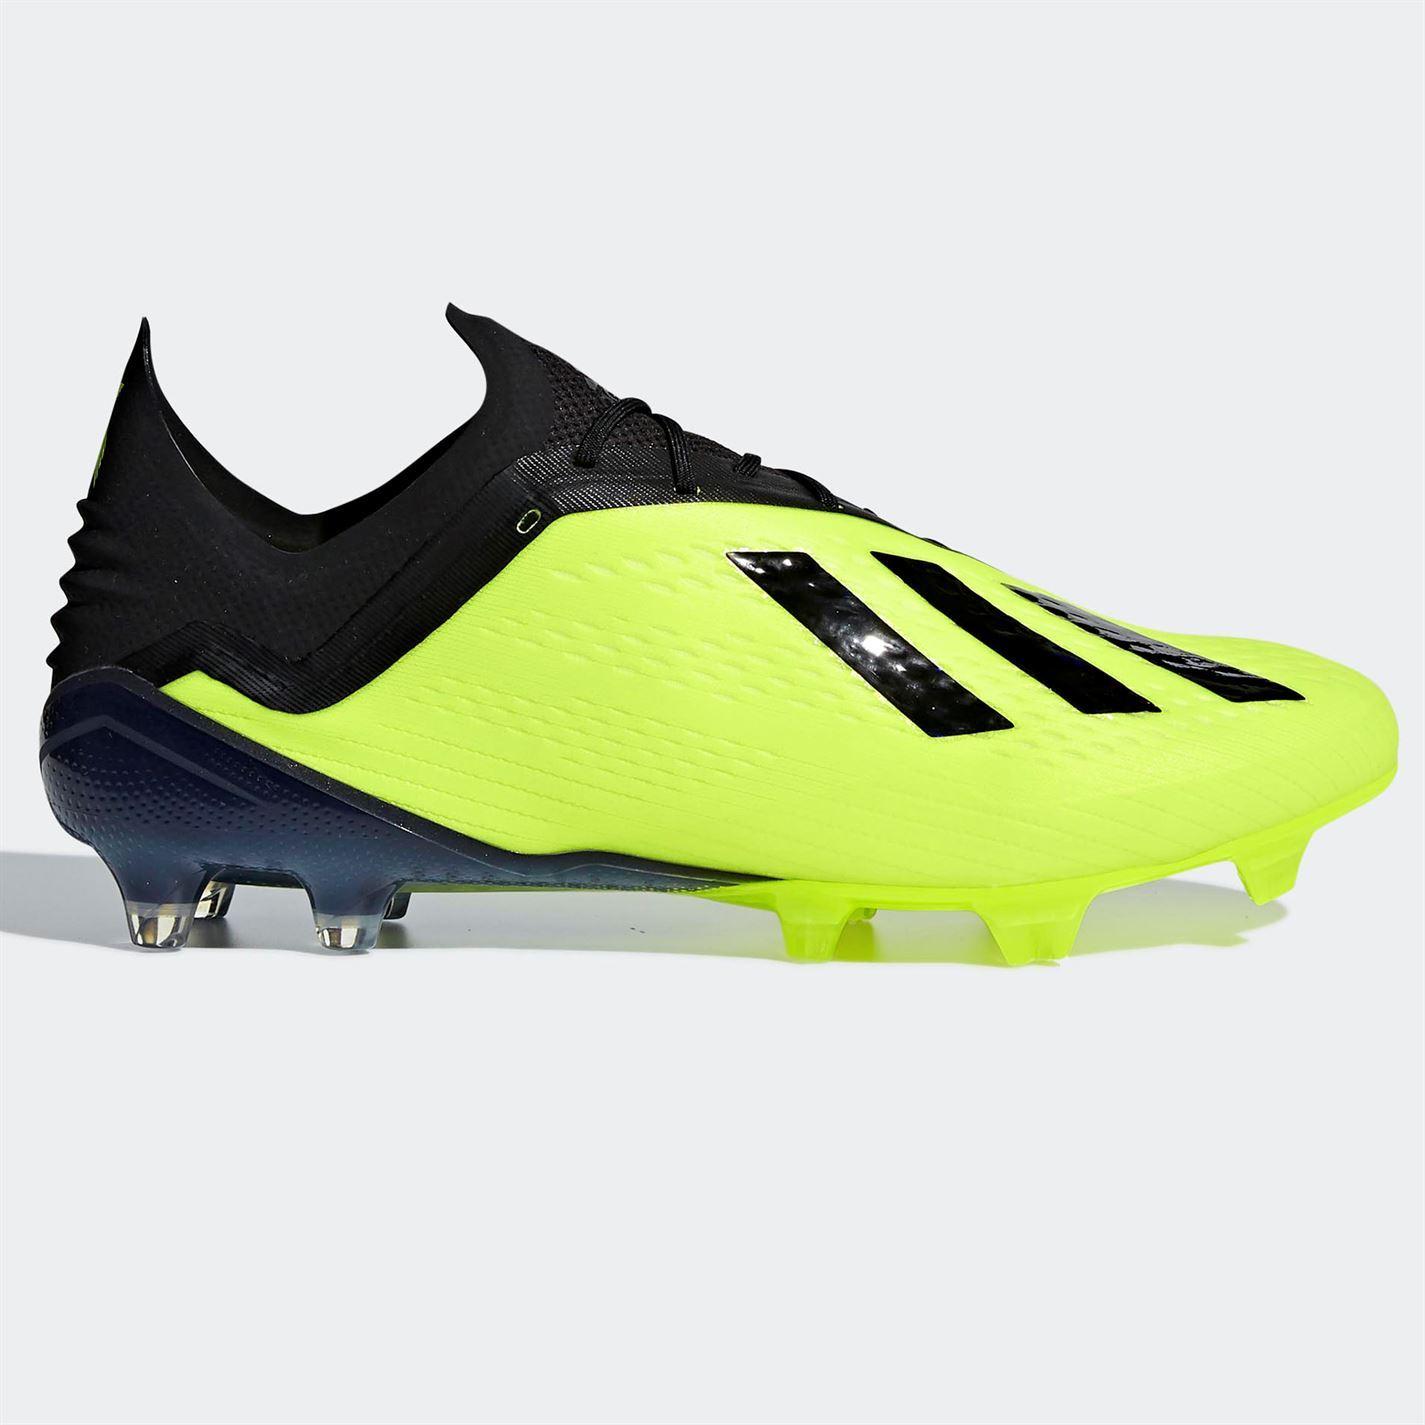 Adidas-x-18-1-FG-Firm-Ground-Chaussures-De-Football-Homme-Football-Chaussures-Crampons miniature 6